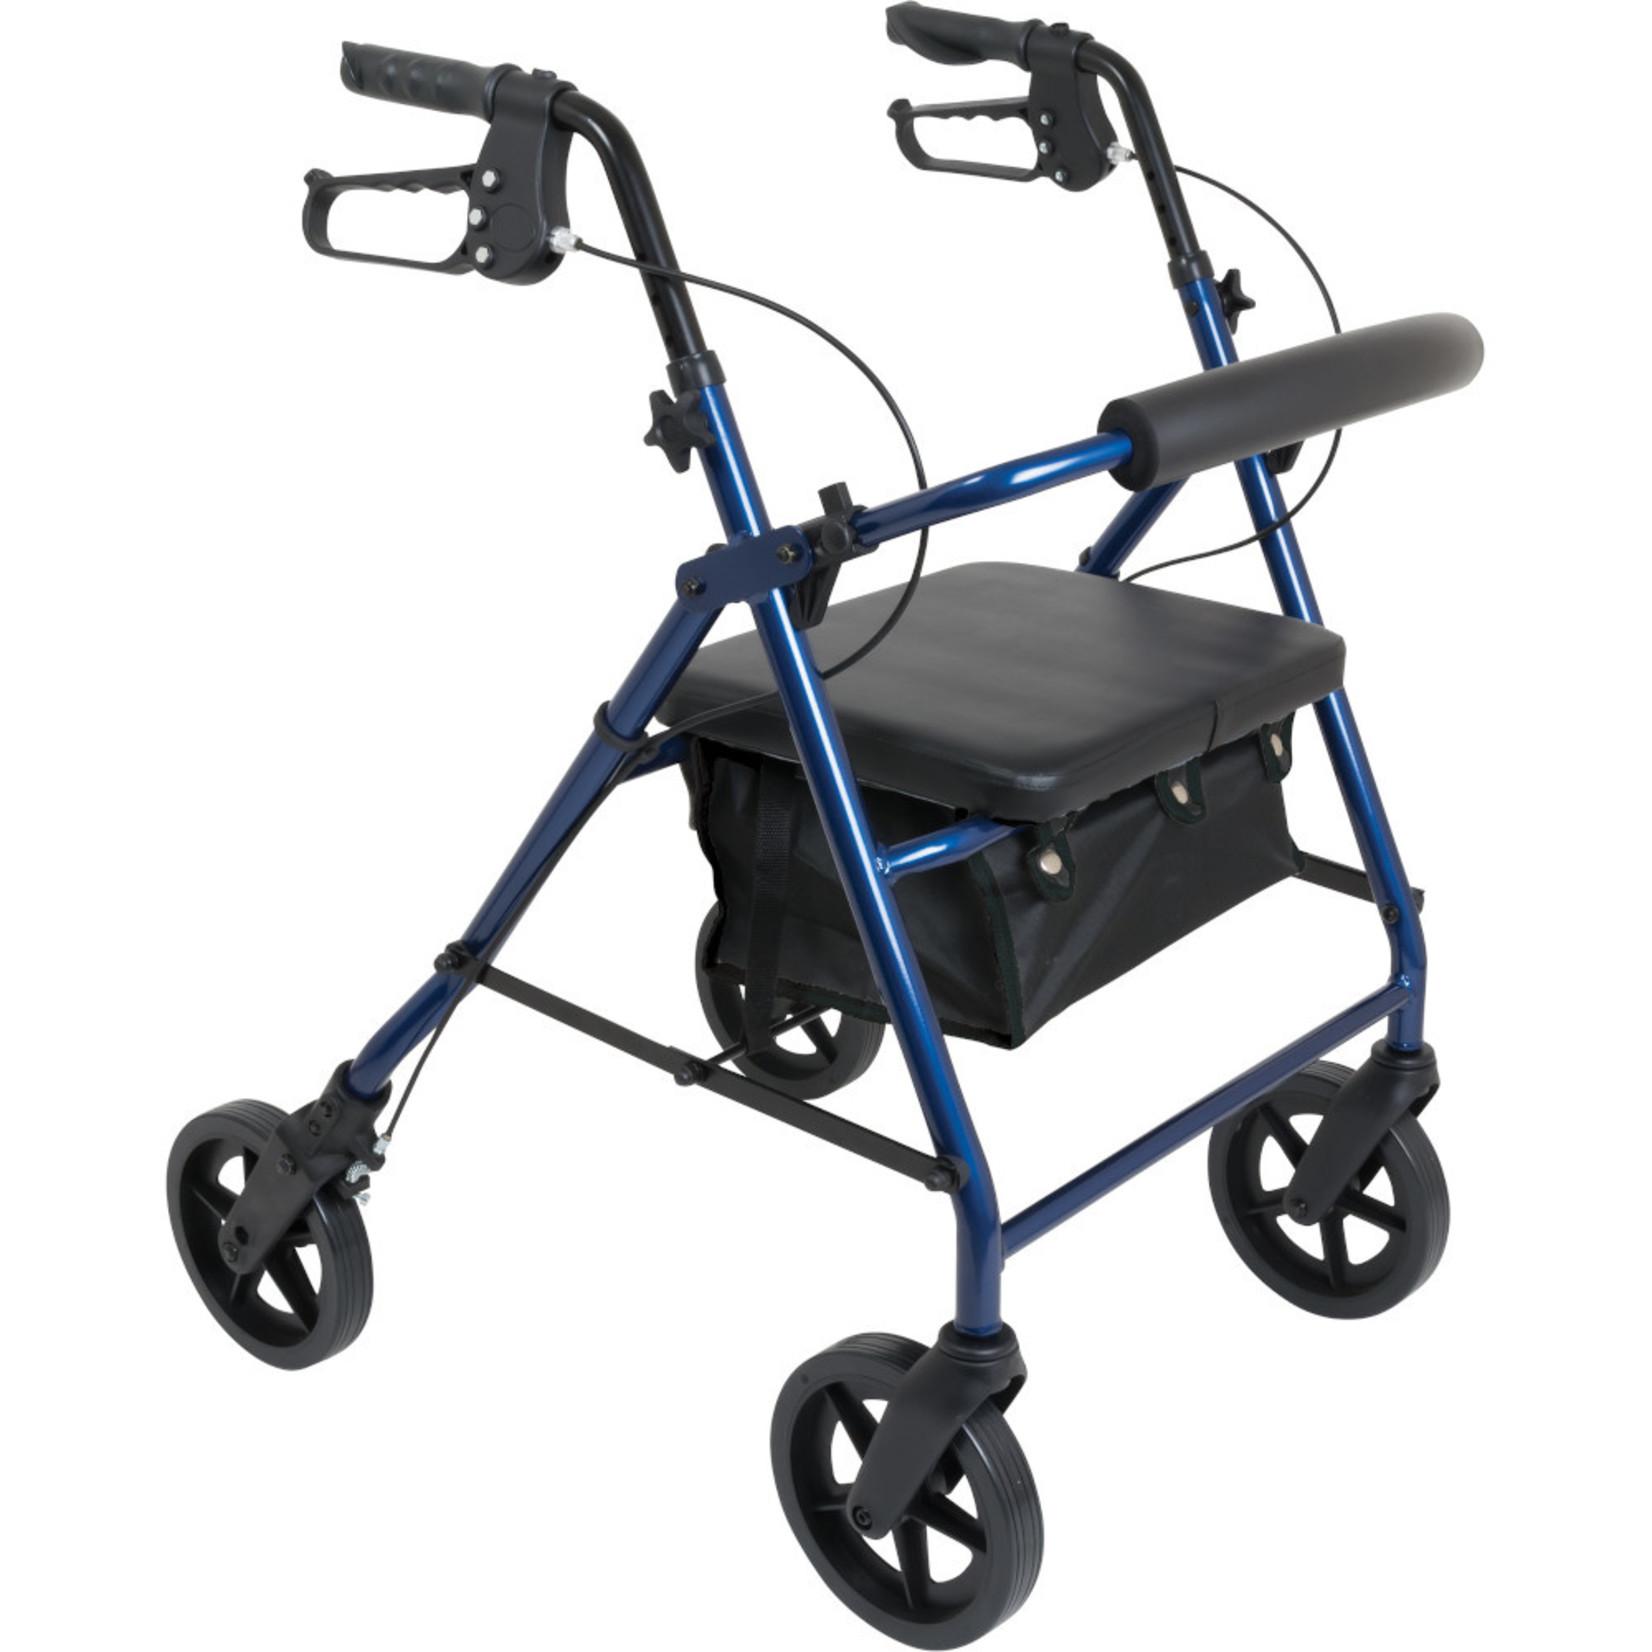 Probasics 4 Wheel Walker 8'' BLUE